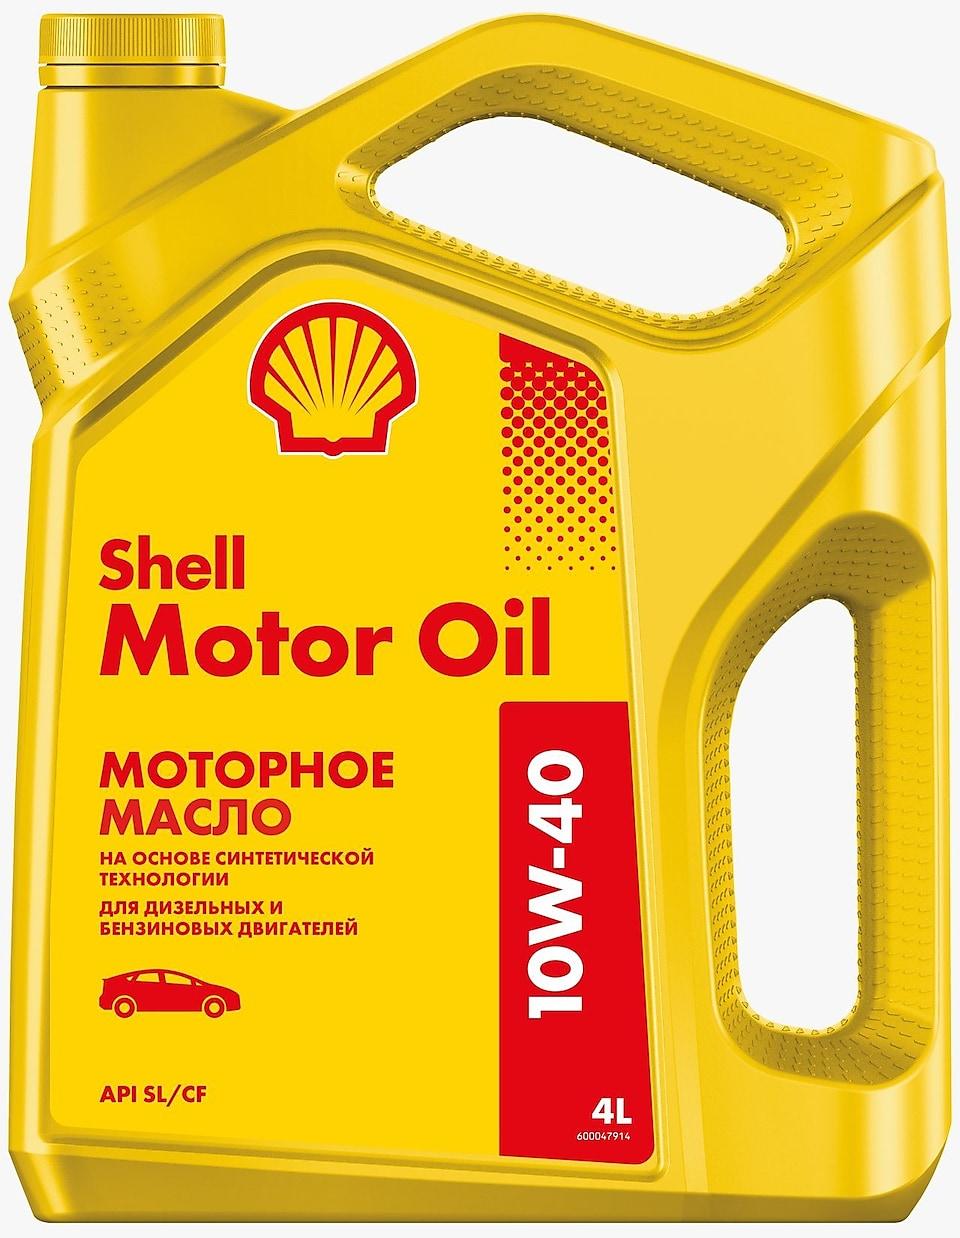 SHELL Motor Oil, 10w-40 SL/CF, полусинтетика, 4л, Финляндия